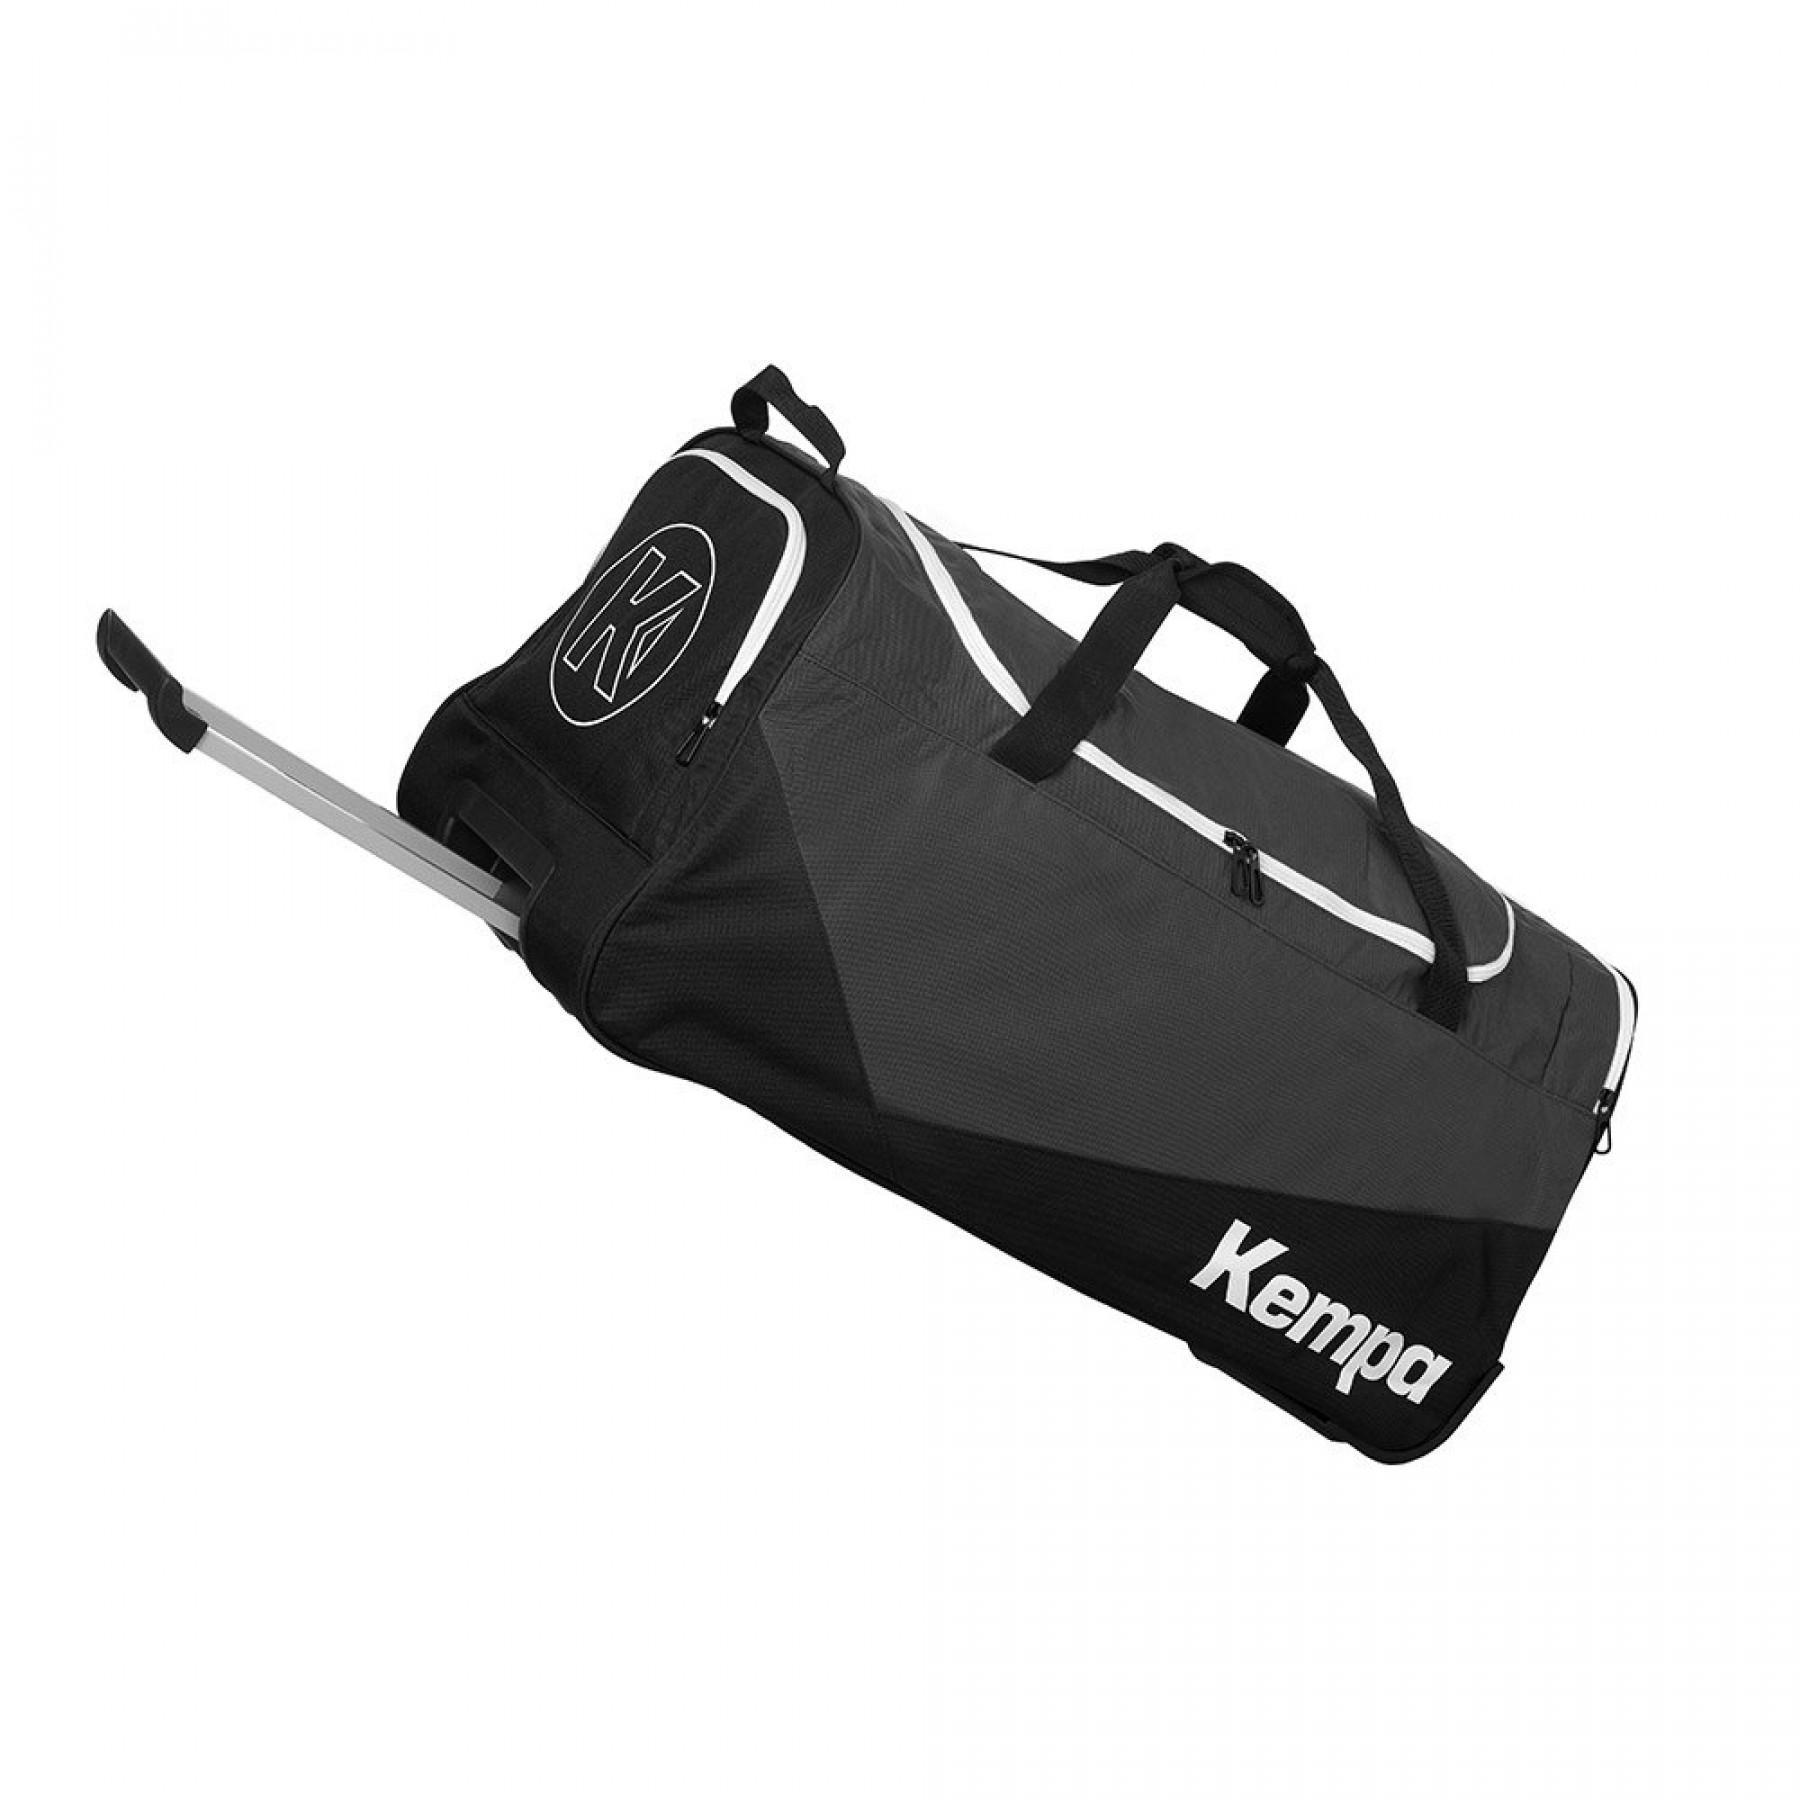 Trolley bag Kempa Large